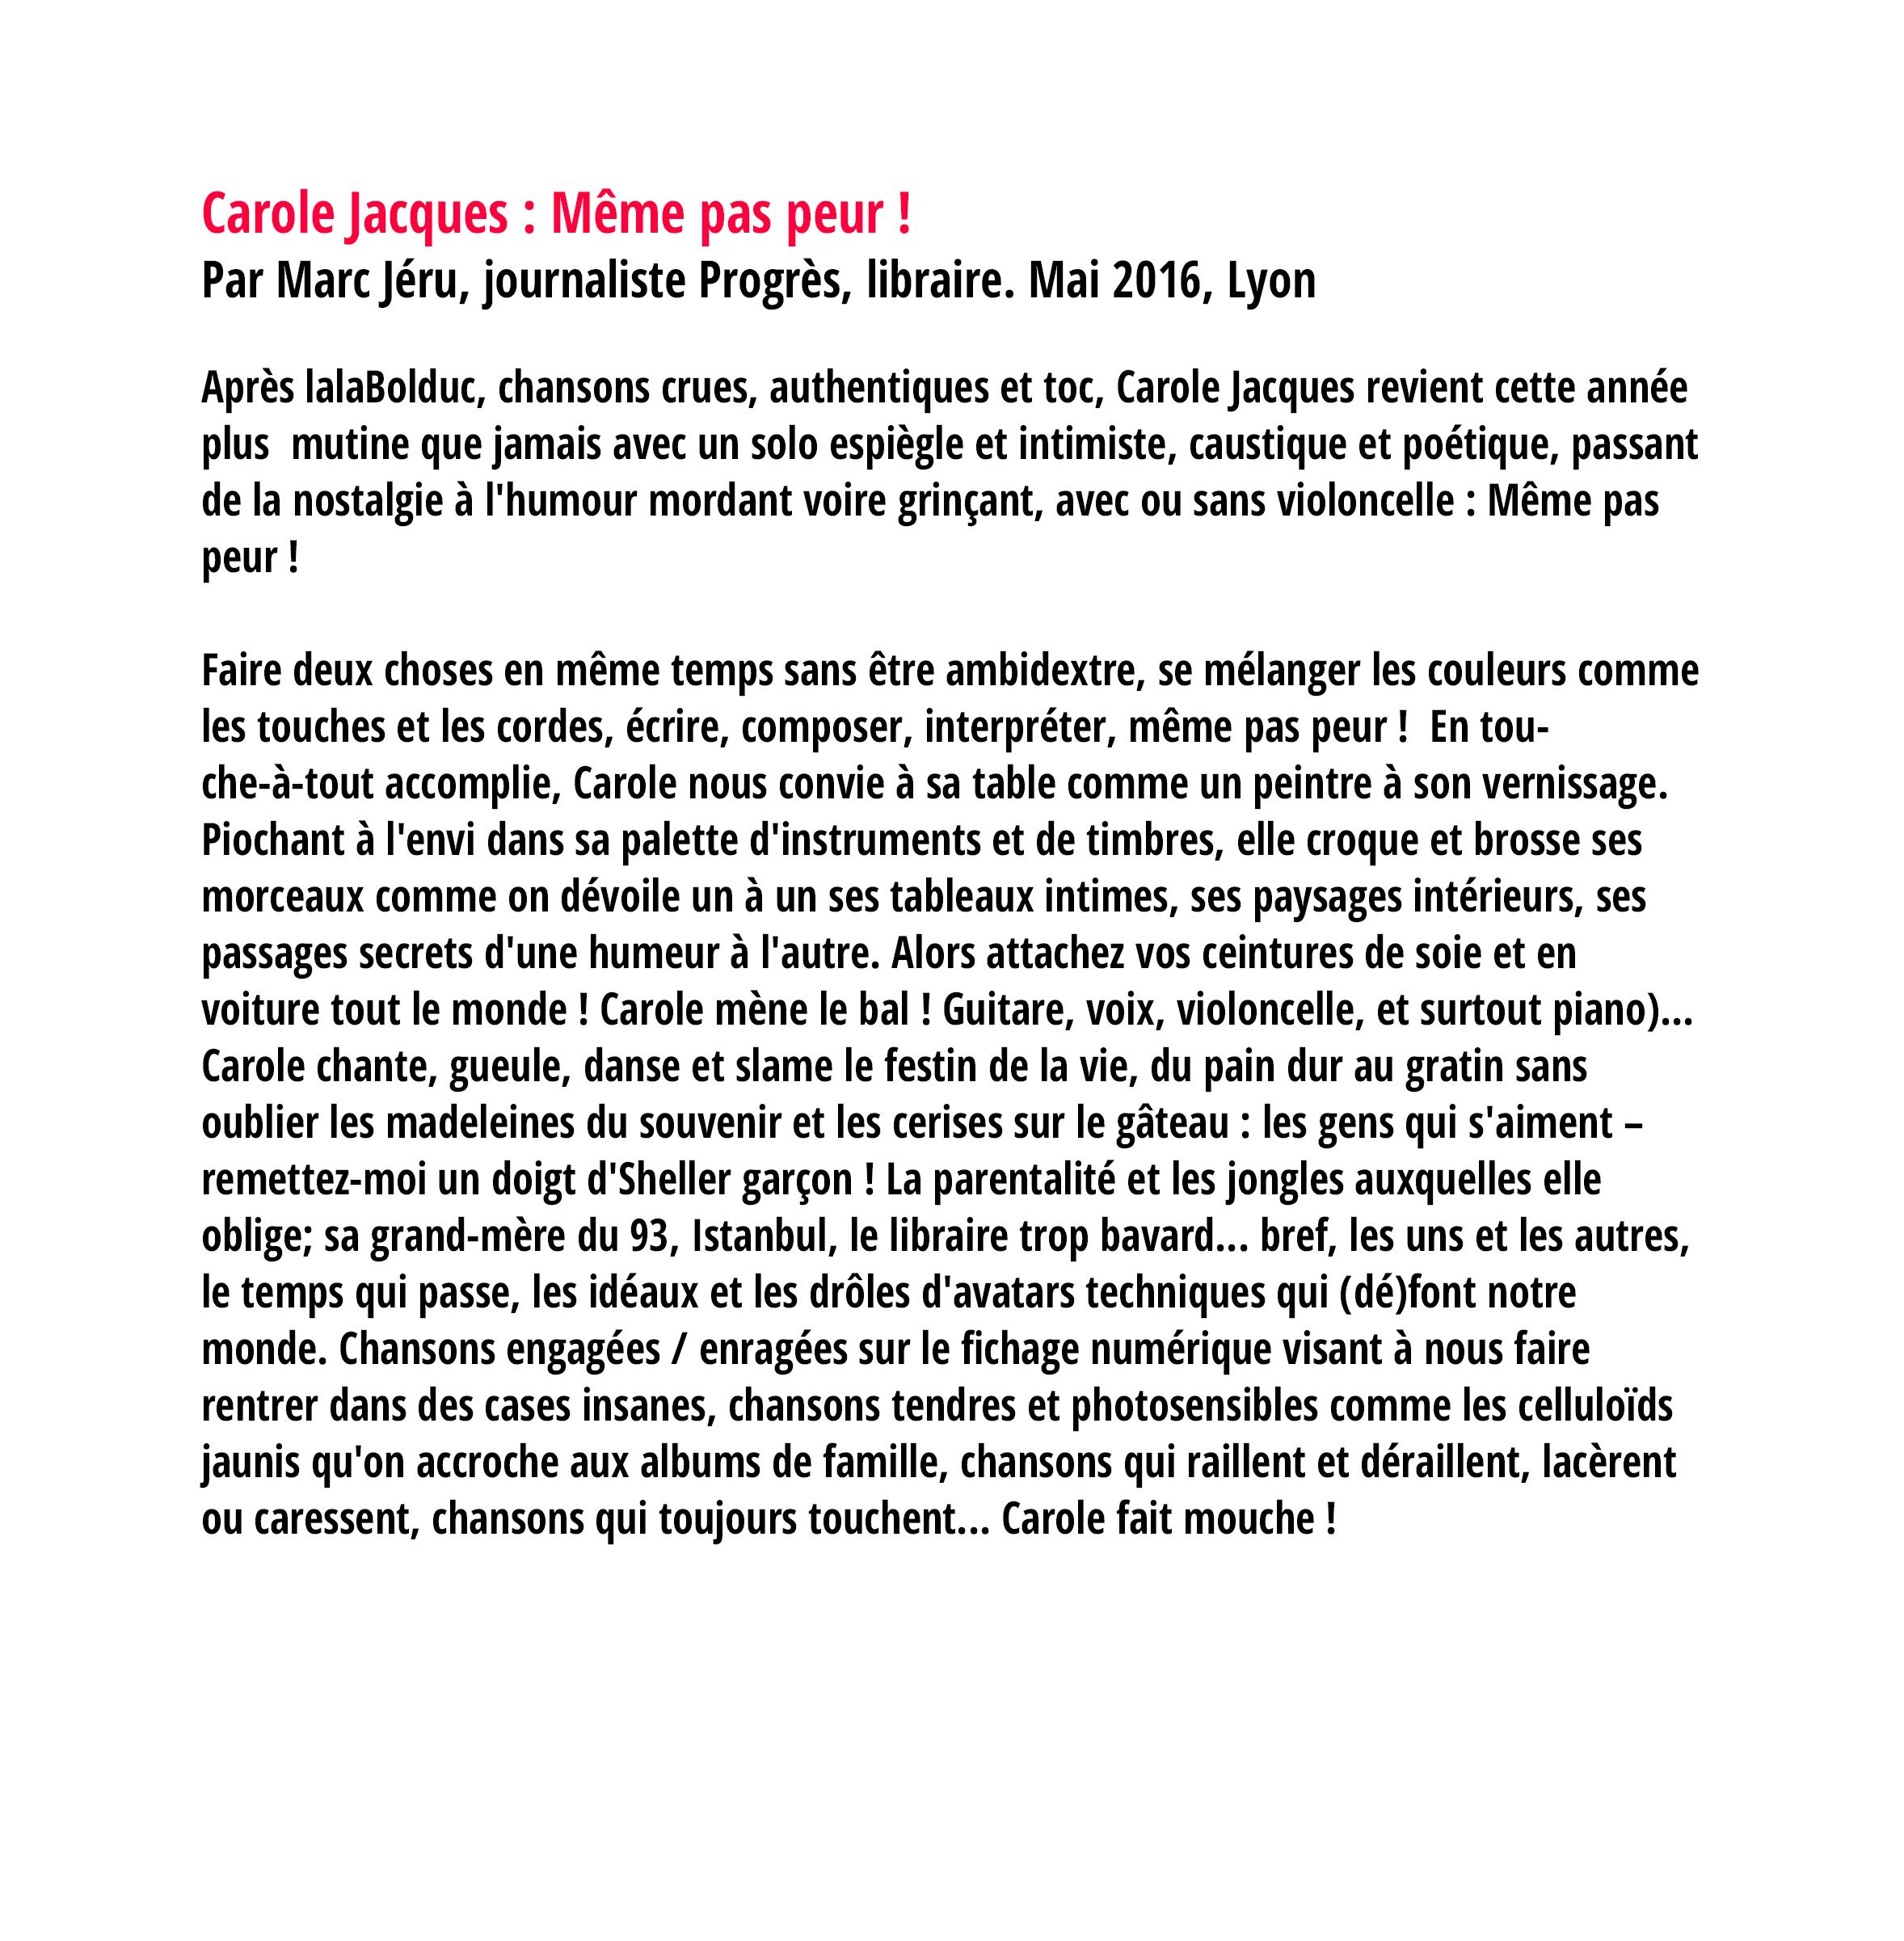 Carole Jacques